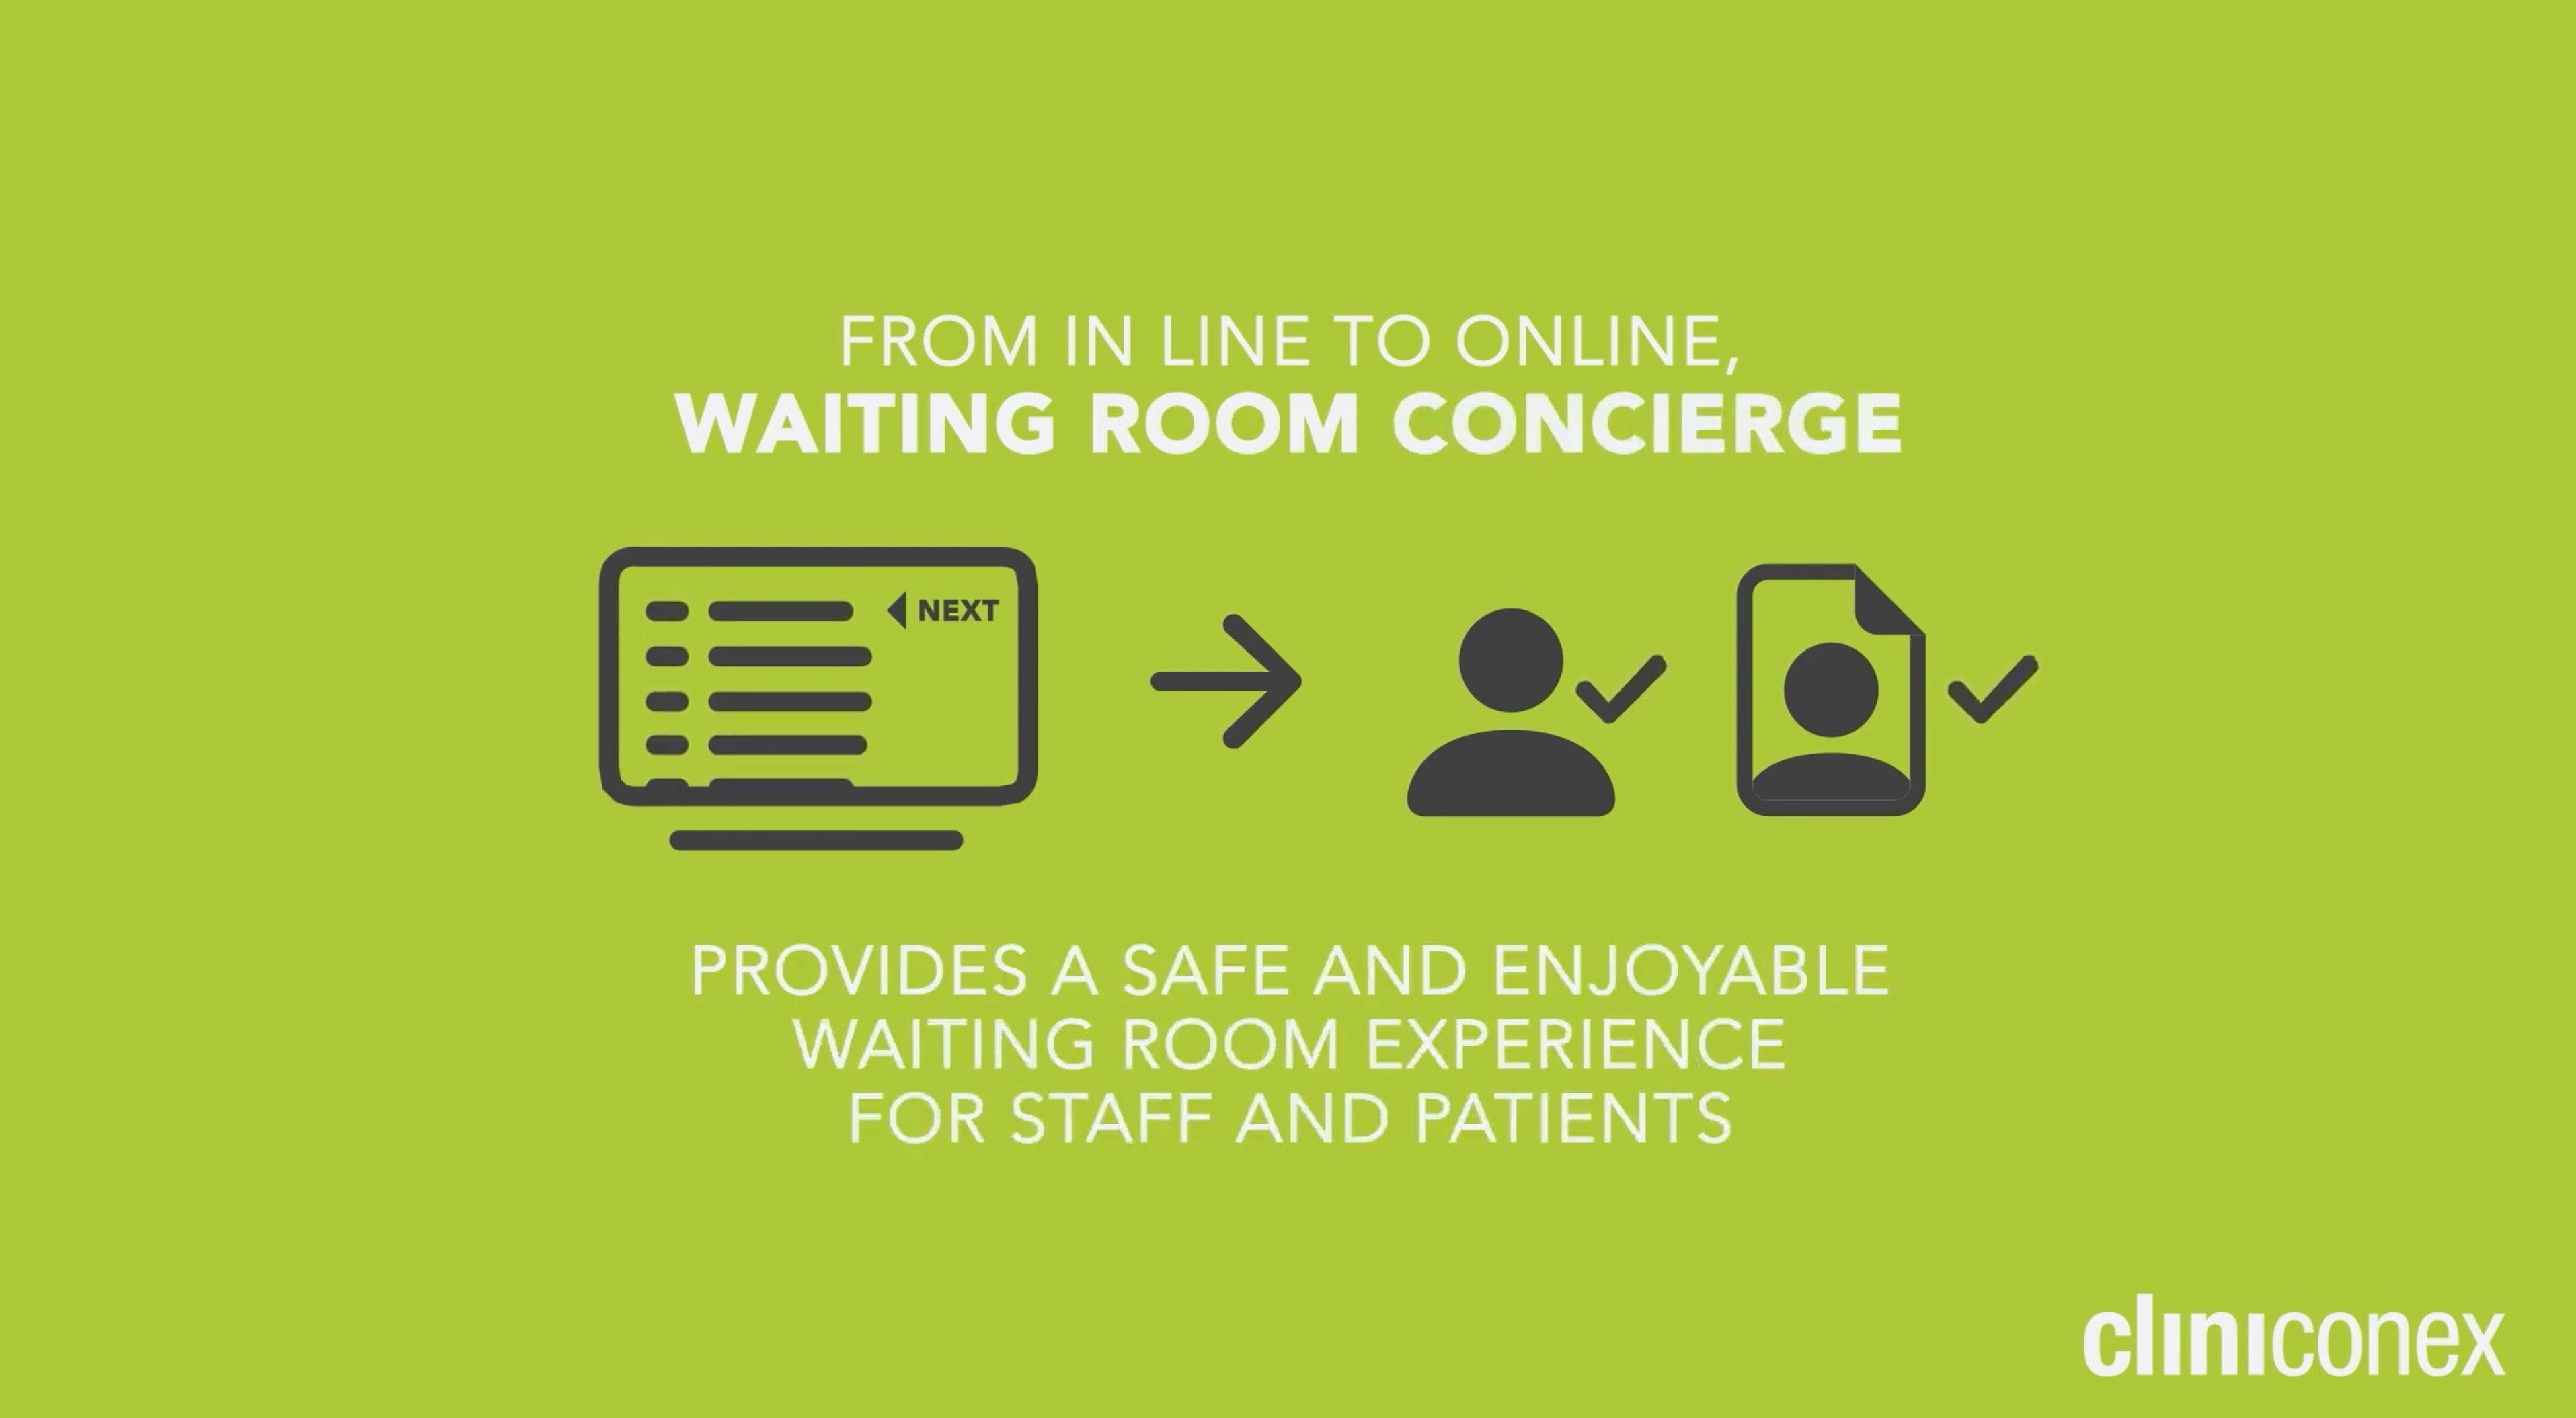 Waiting Room Concierge